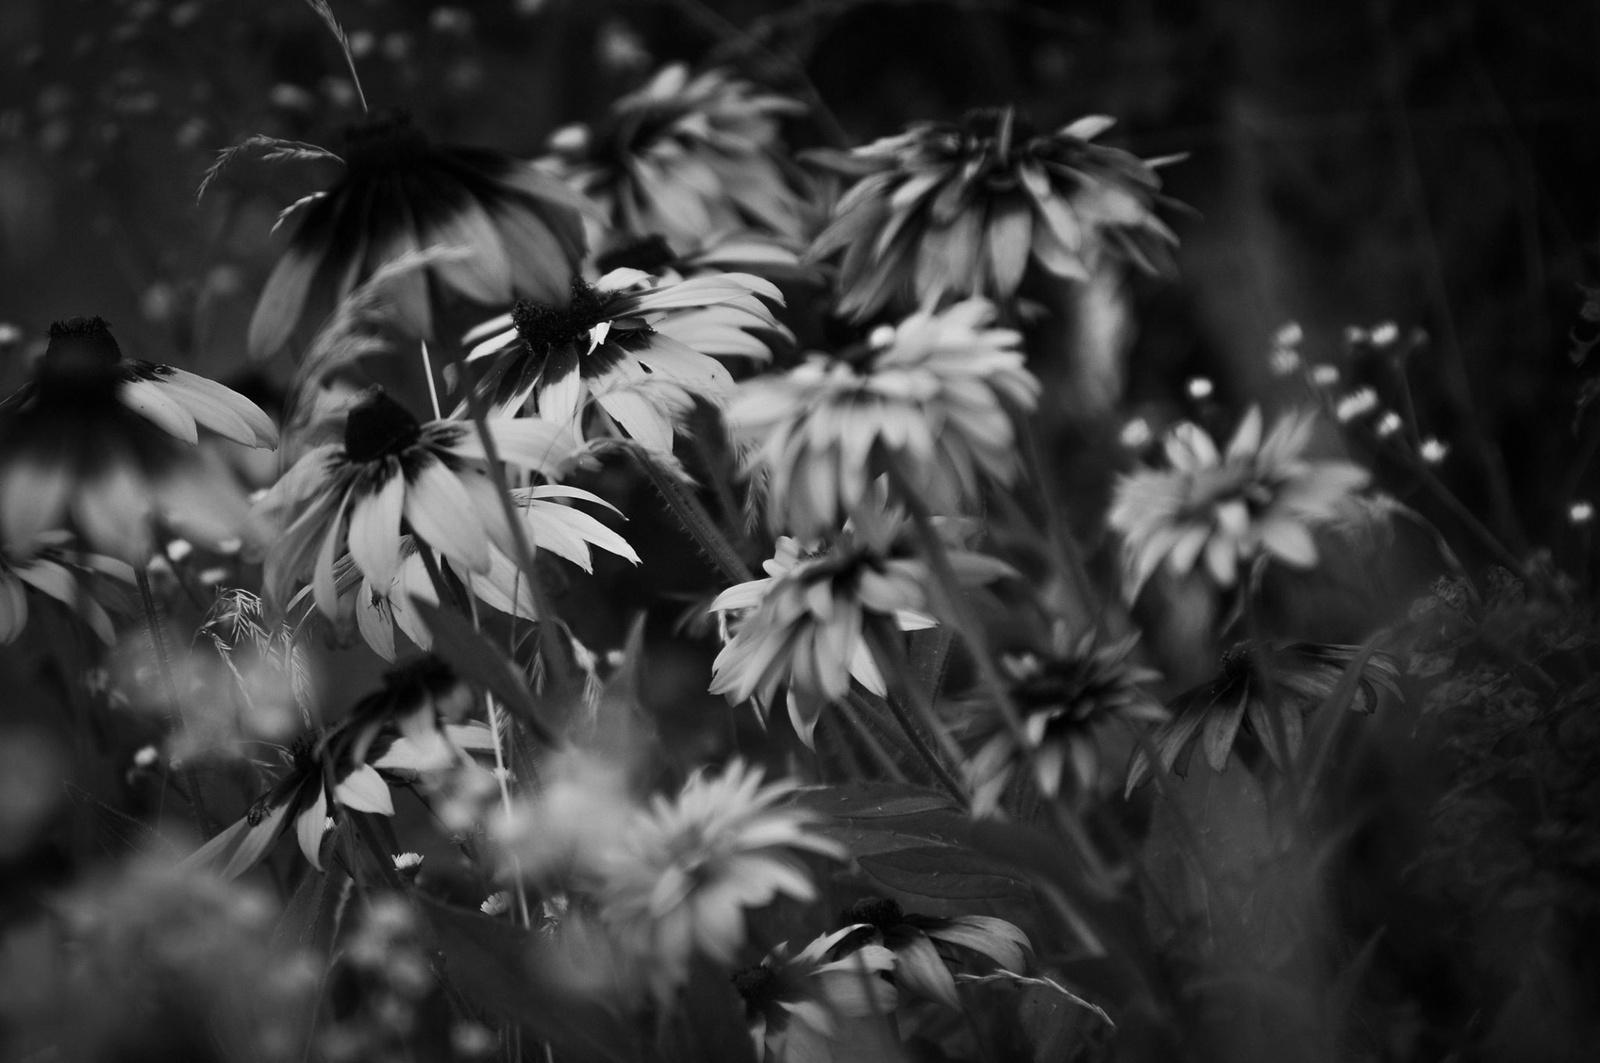 Virágok szélbenFFFFFFFF